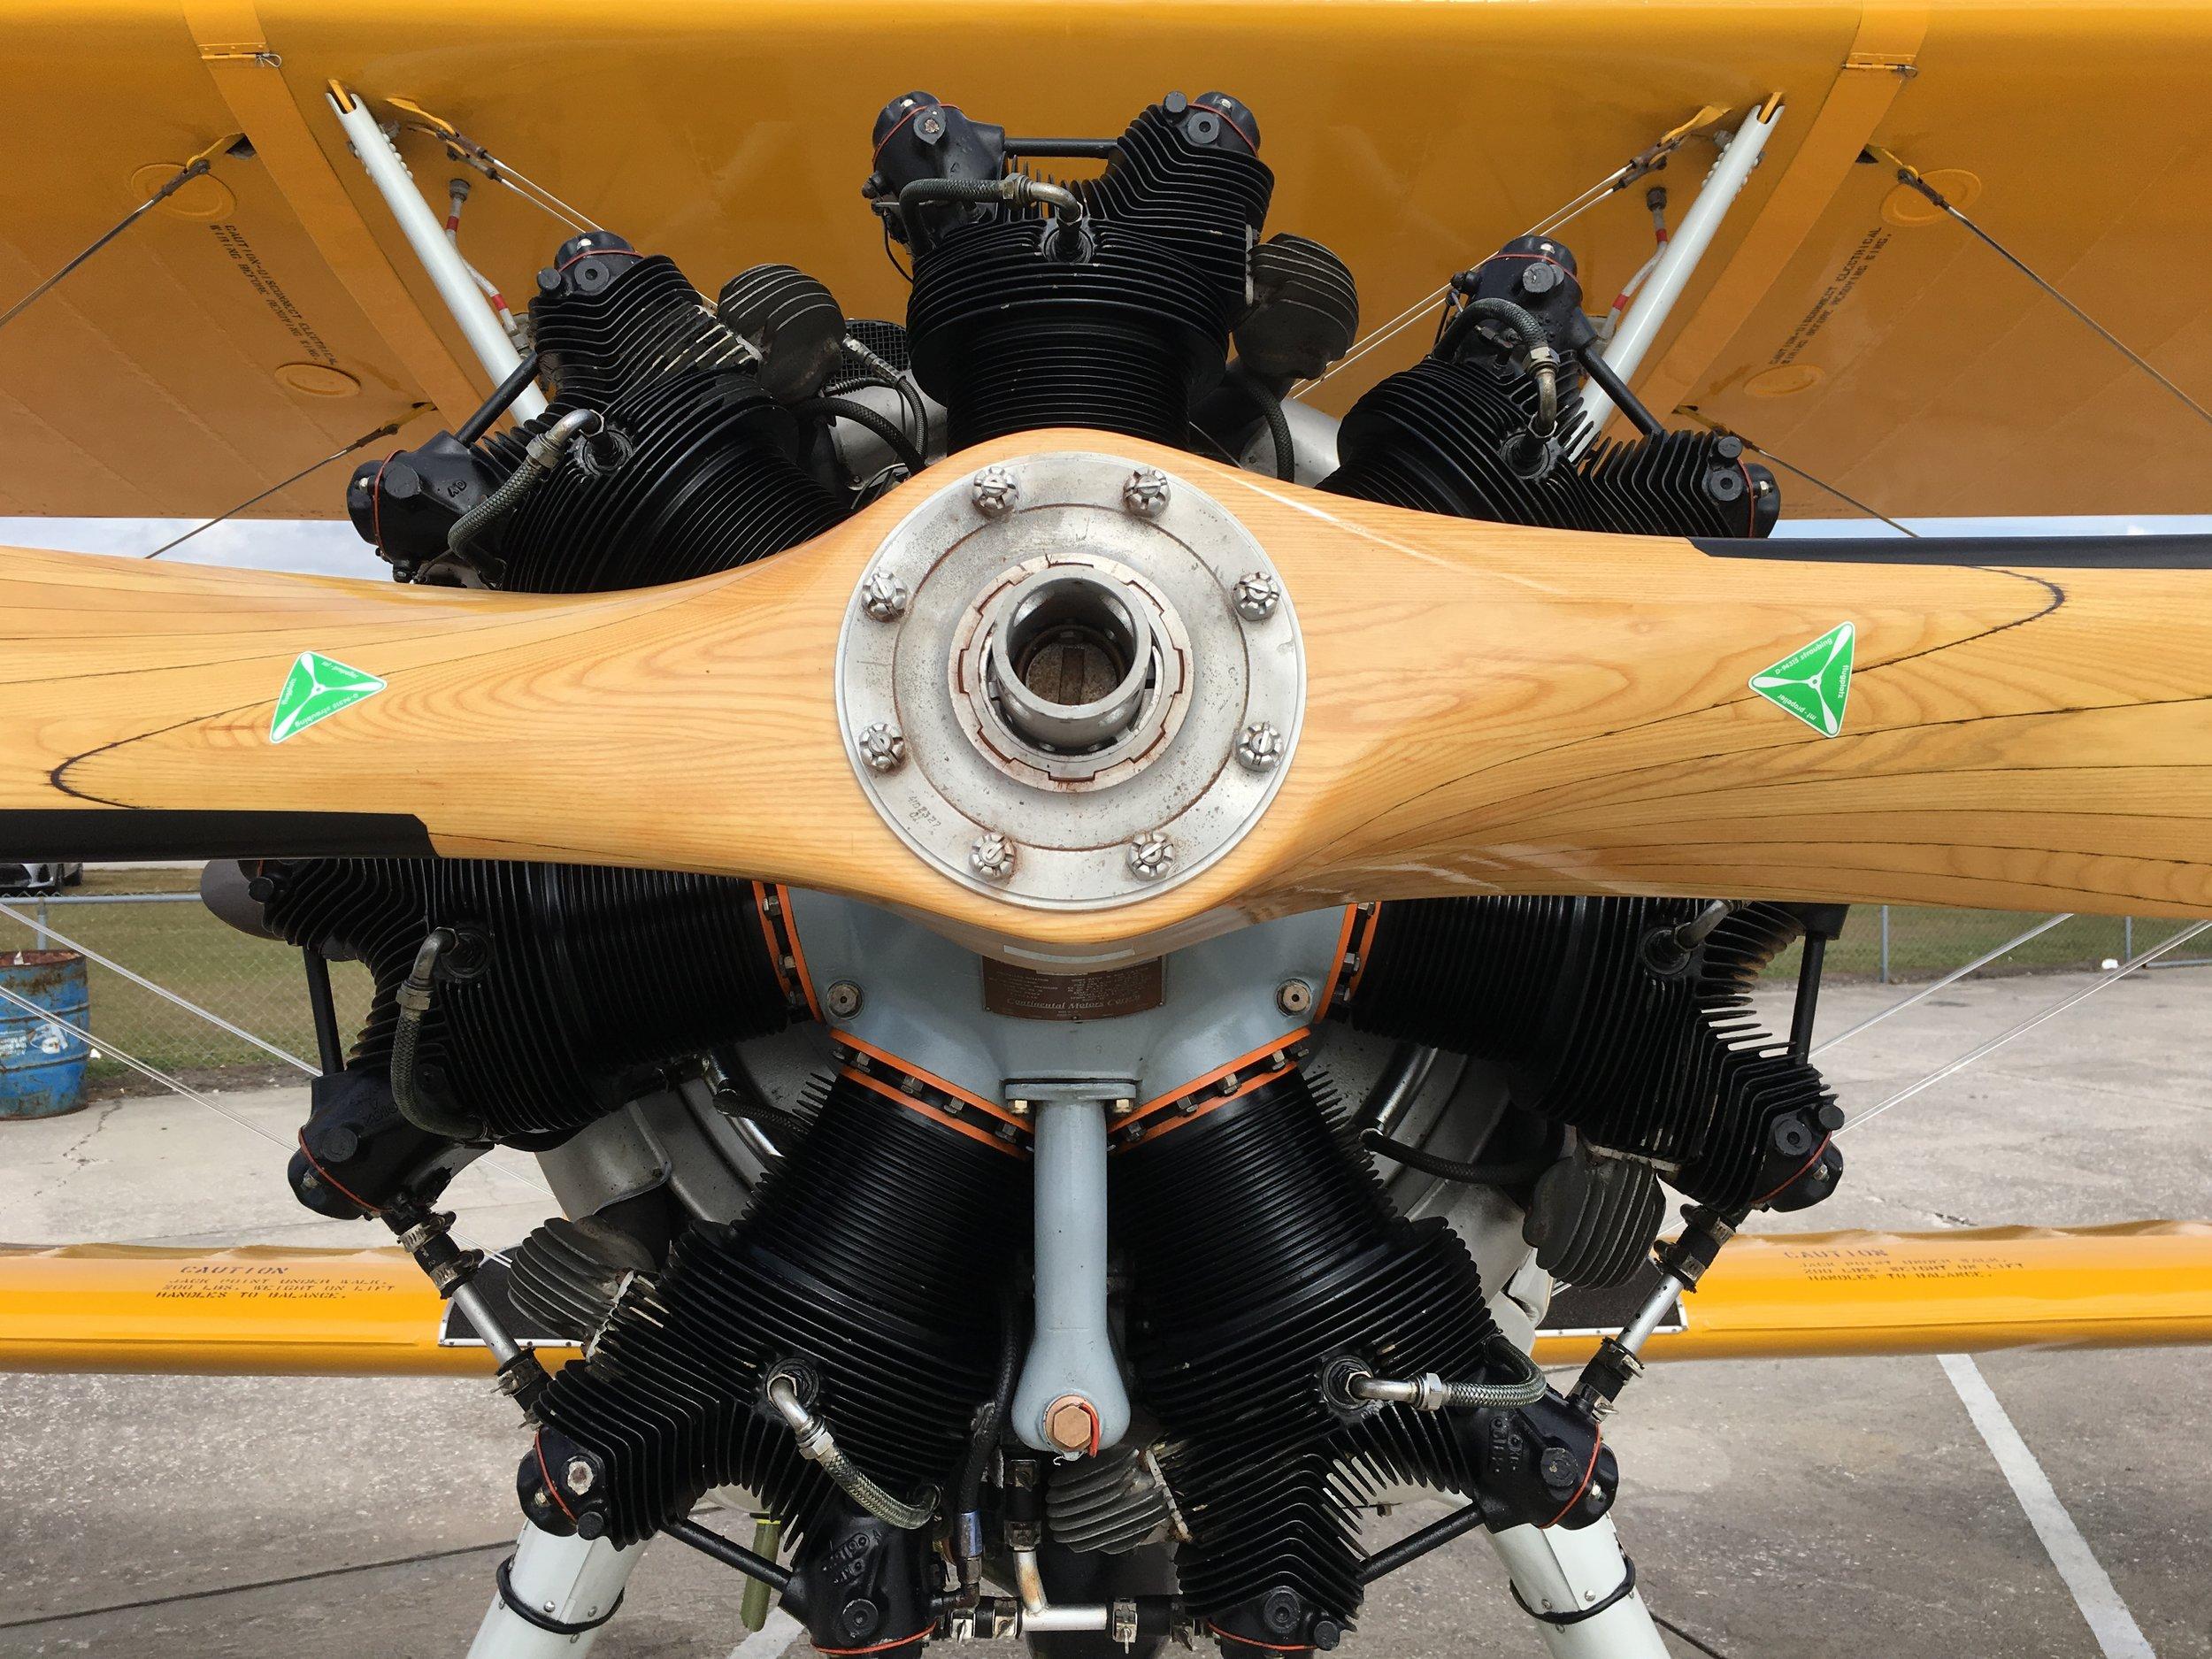 12EEF7EF-88E0-4929-93AB-9C6BEFB616E4.JPG